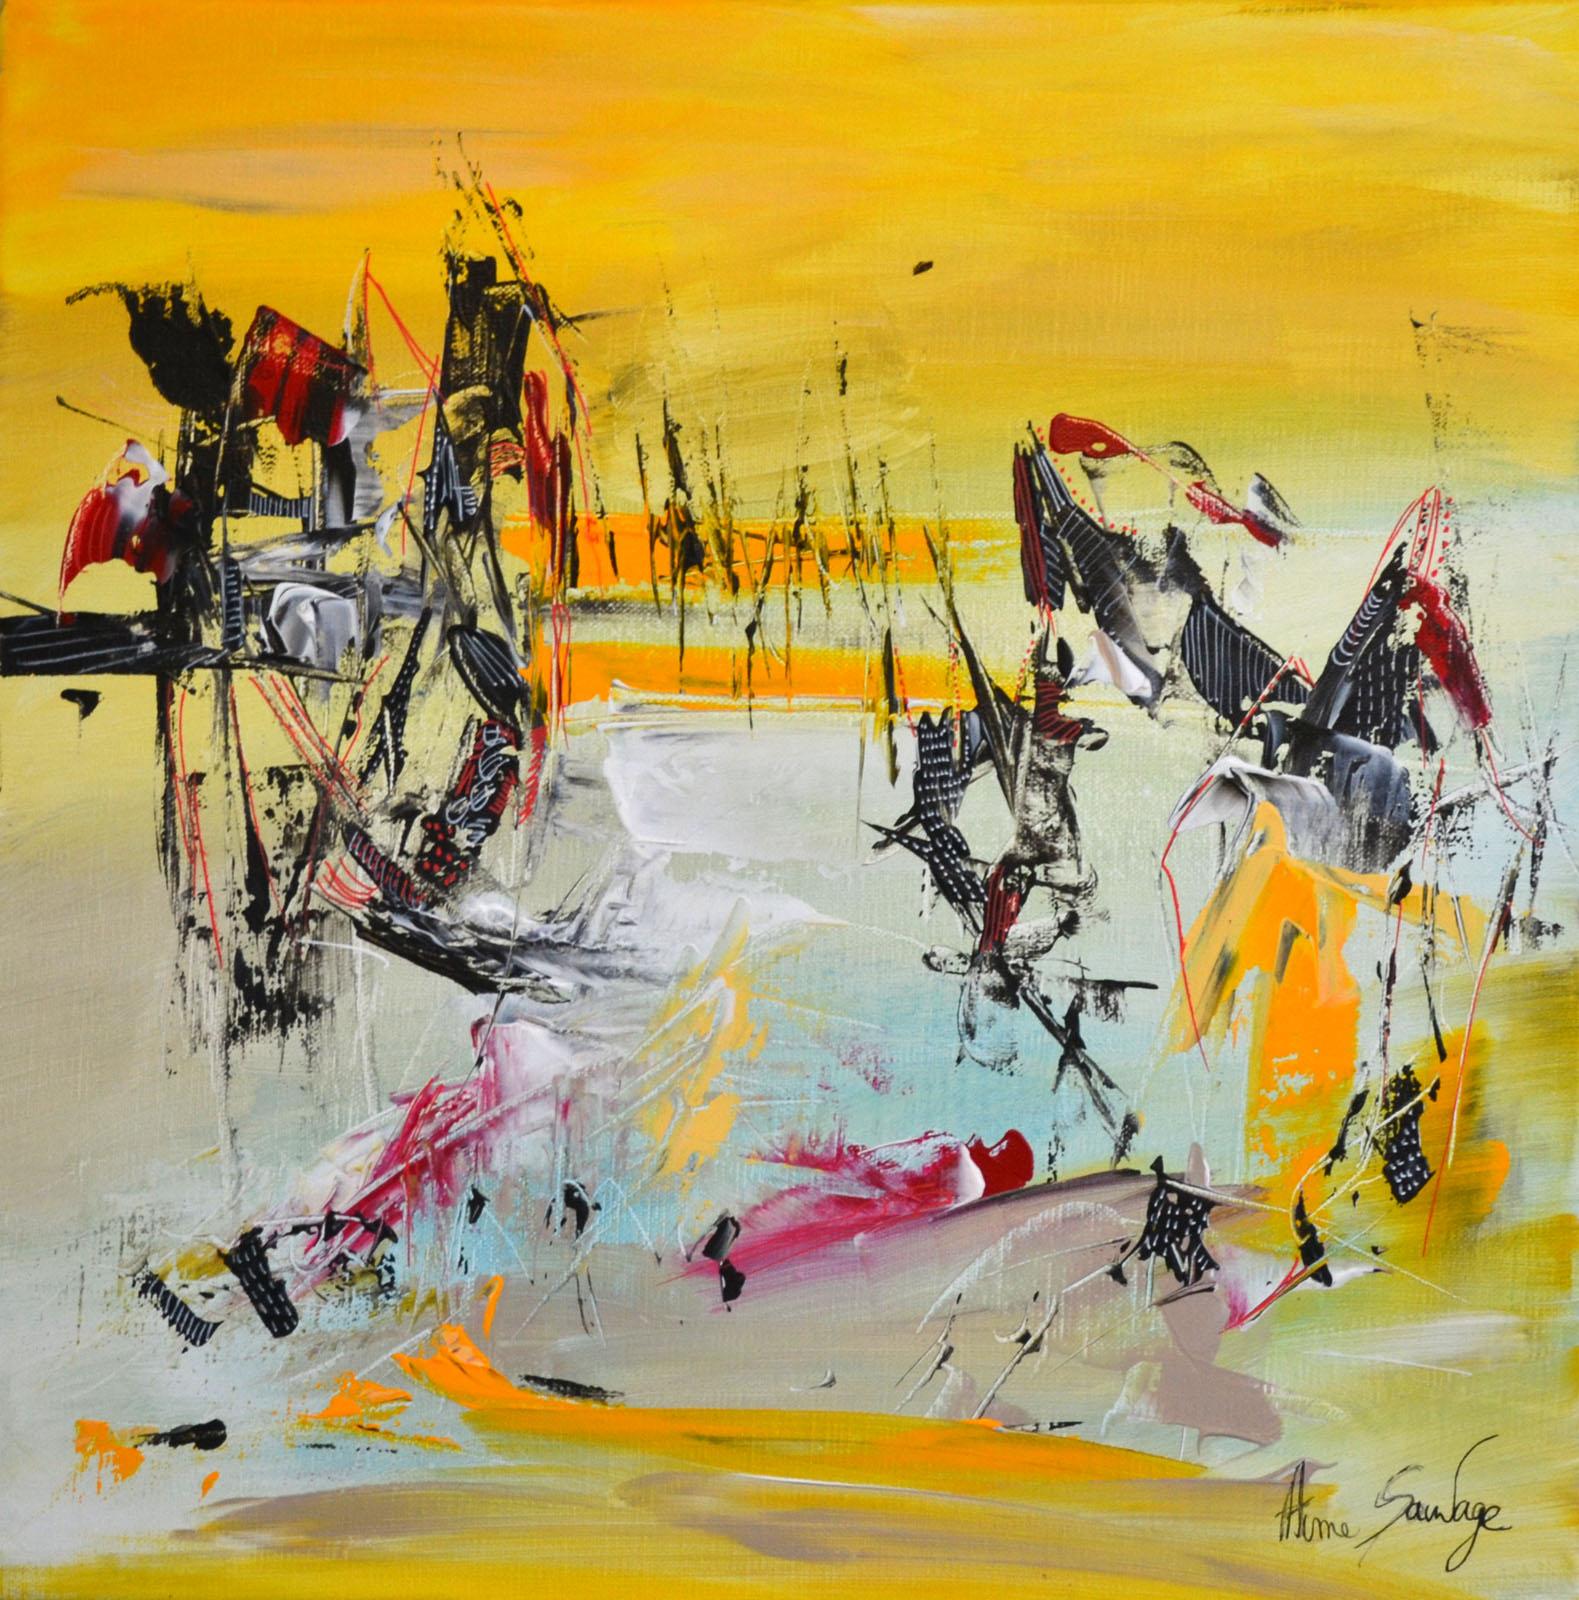 peinture moderne jaune carrée